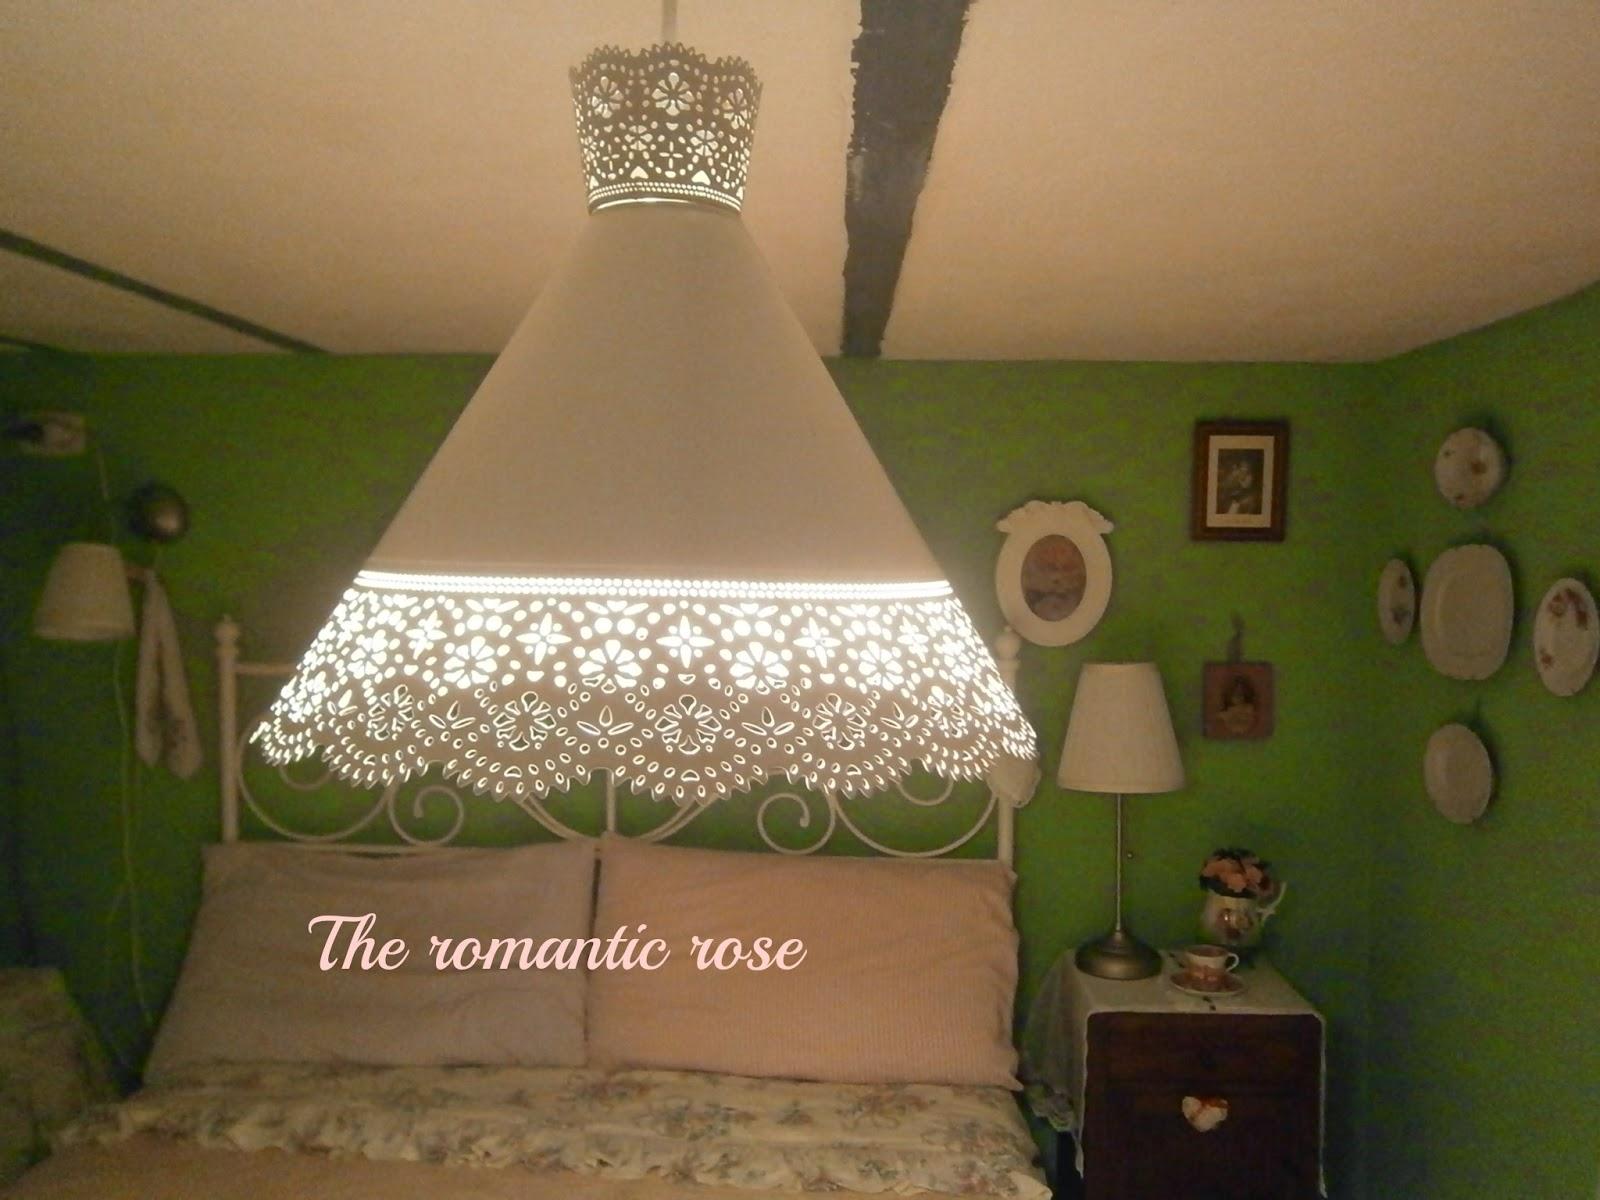 Lampada cartone ikea: lampadari fai da te con lo spago fare i ...